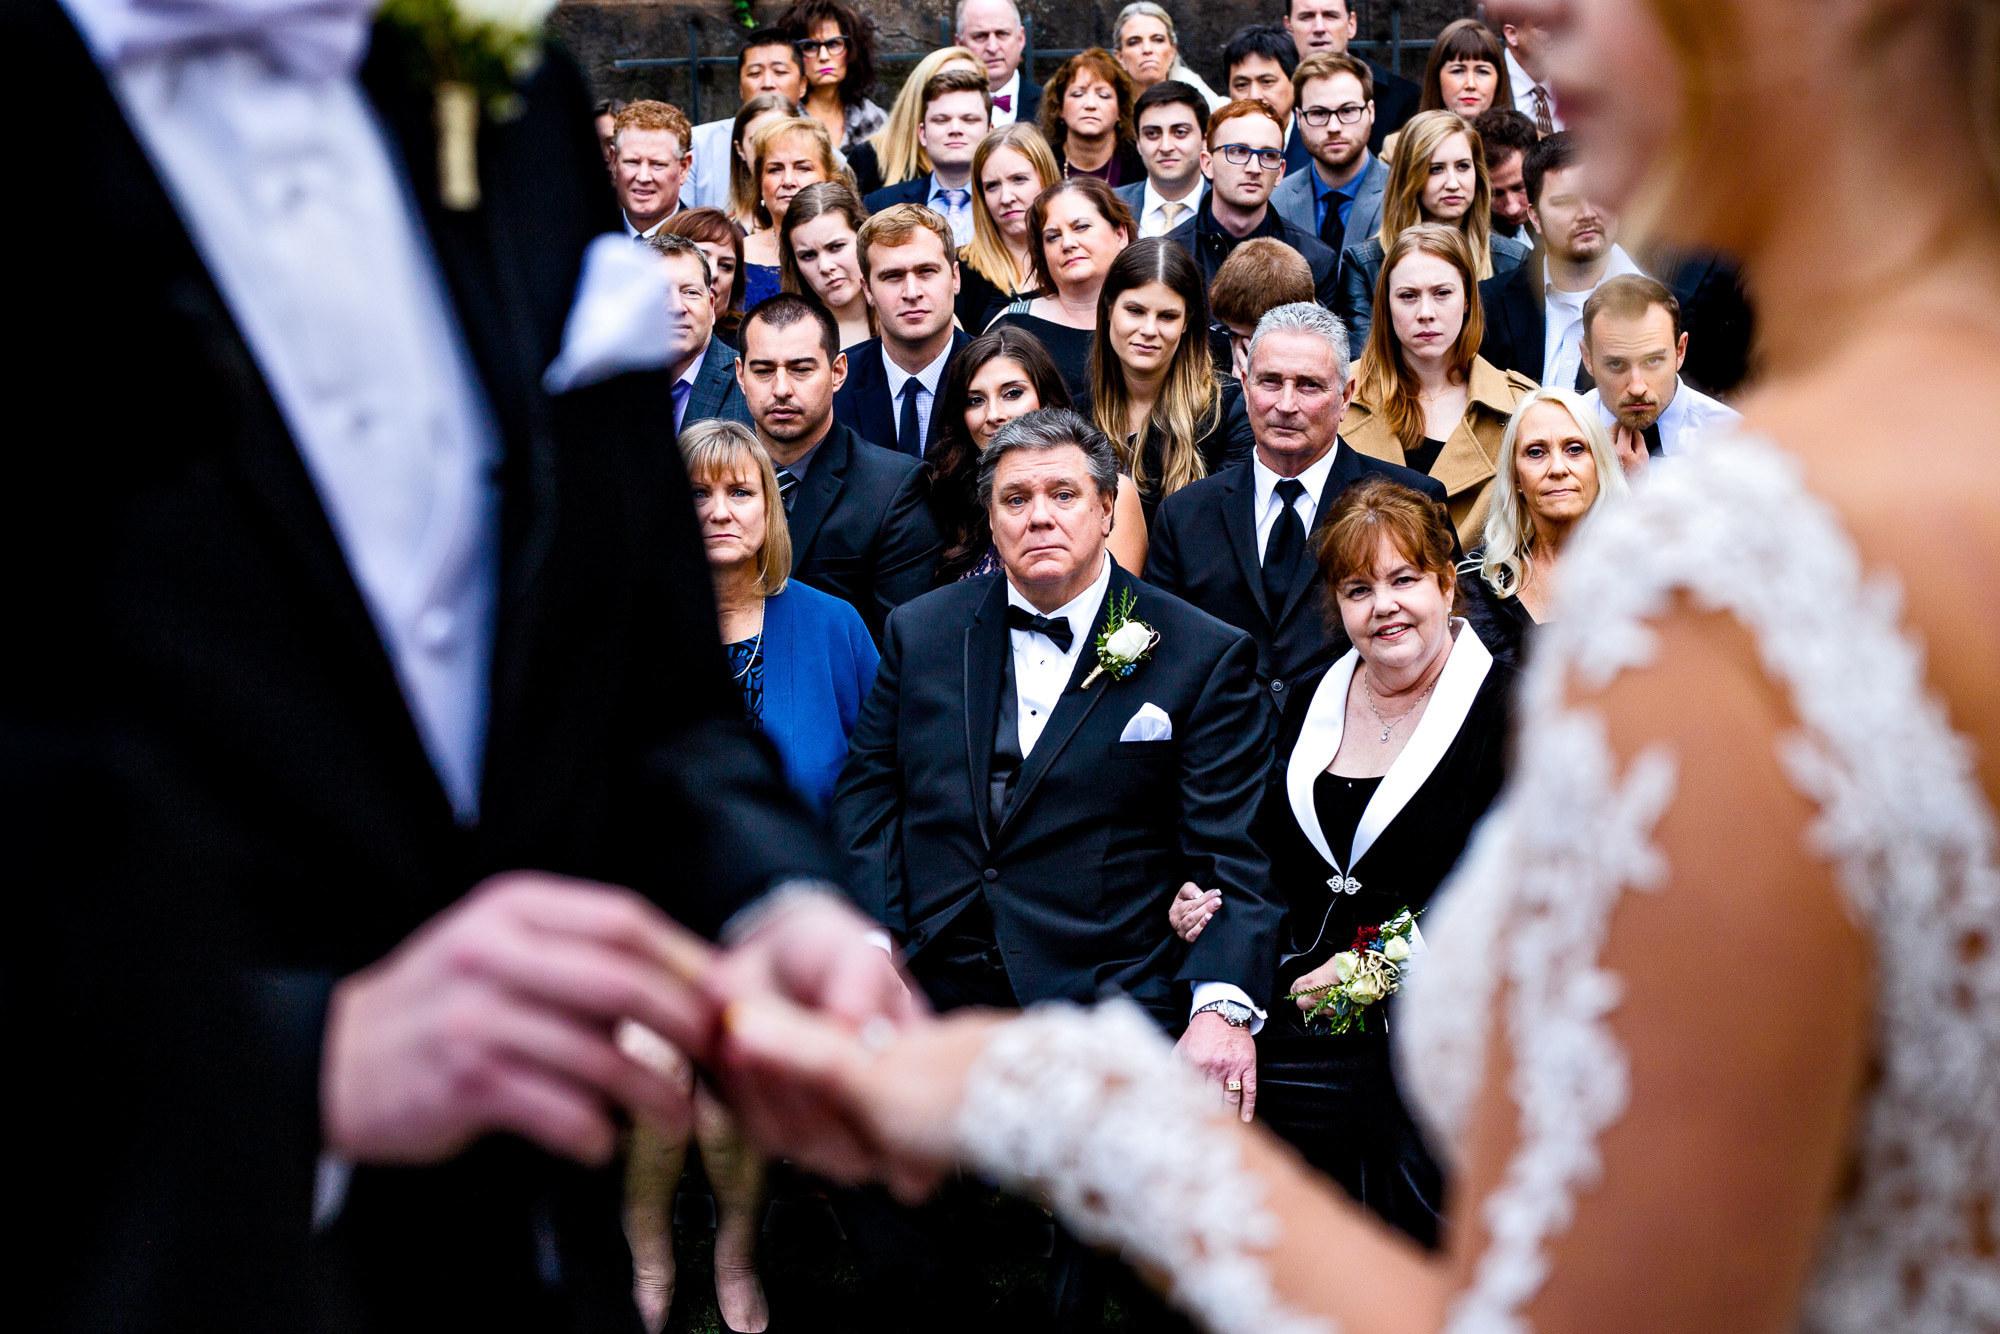 stricken-father-looks-on-during-ceremony-worlds-best-wedding-photographers-columbia-gorge-hotel-wedding-josstudios